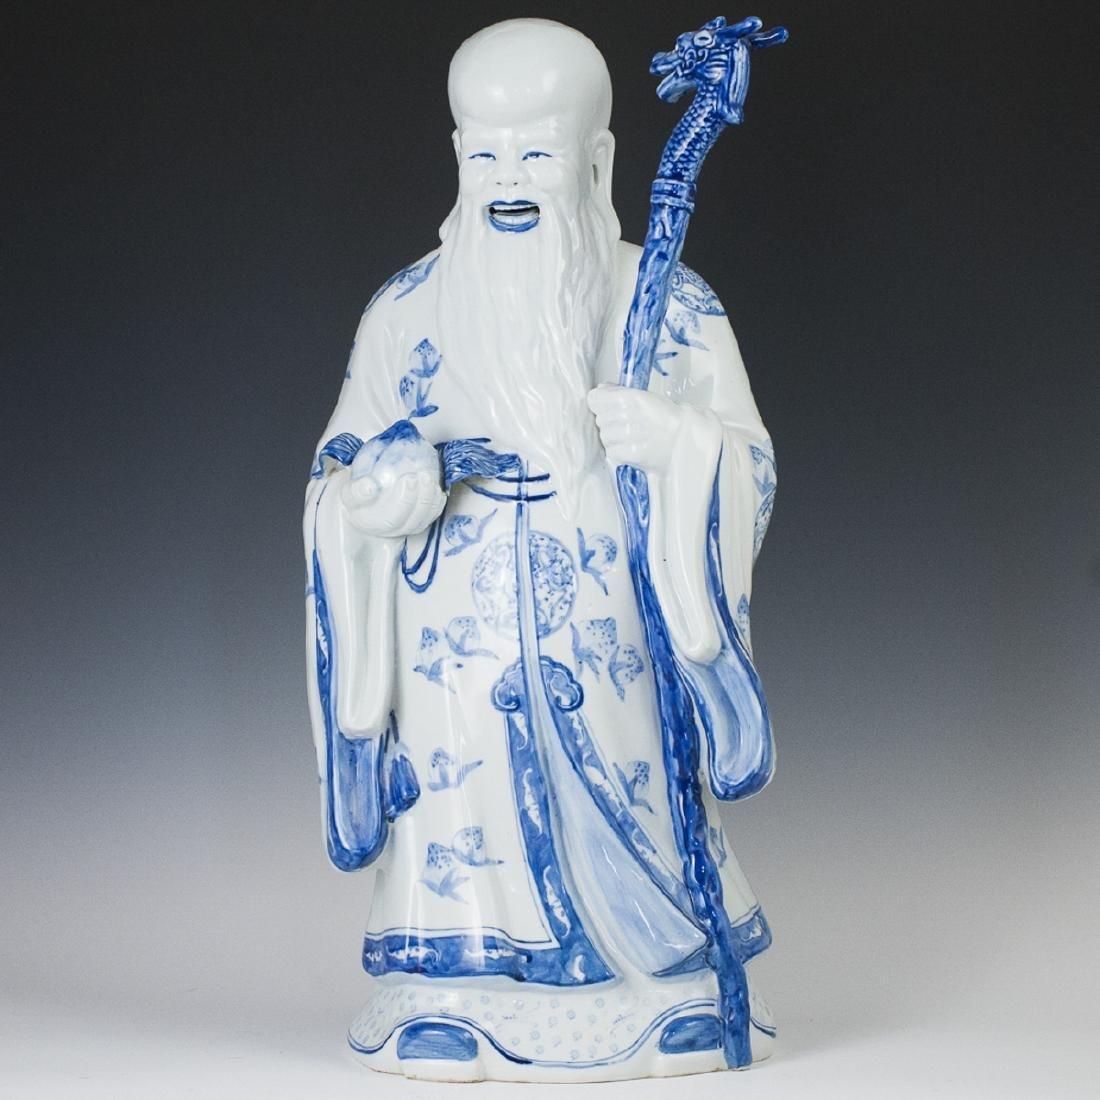 Chinese Decorative Porcelain Shou Xing